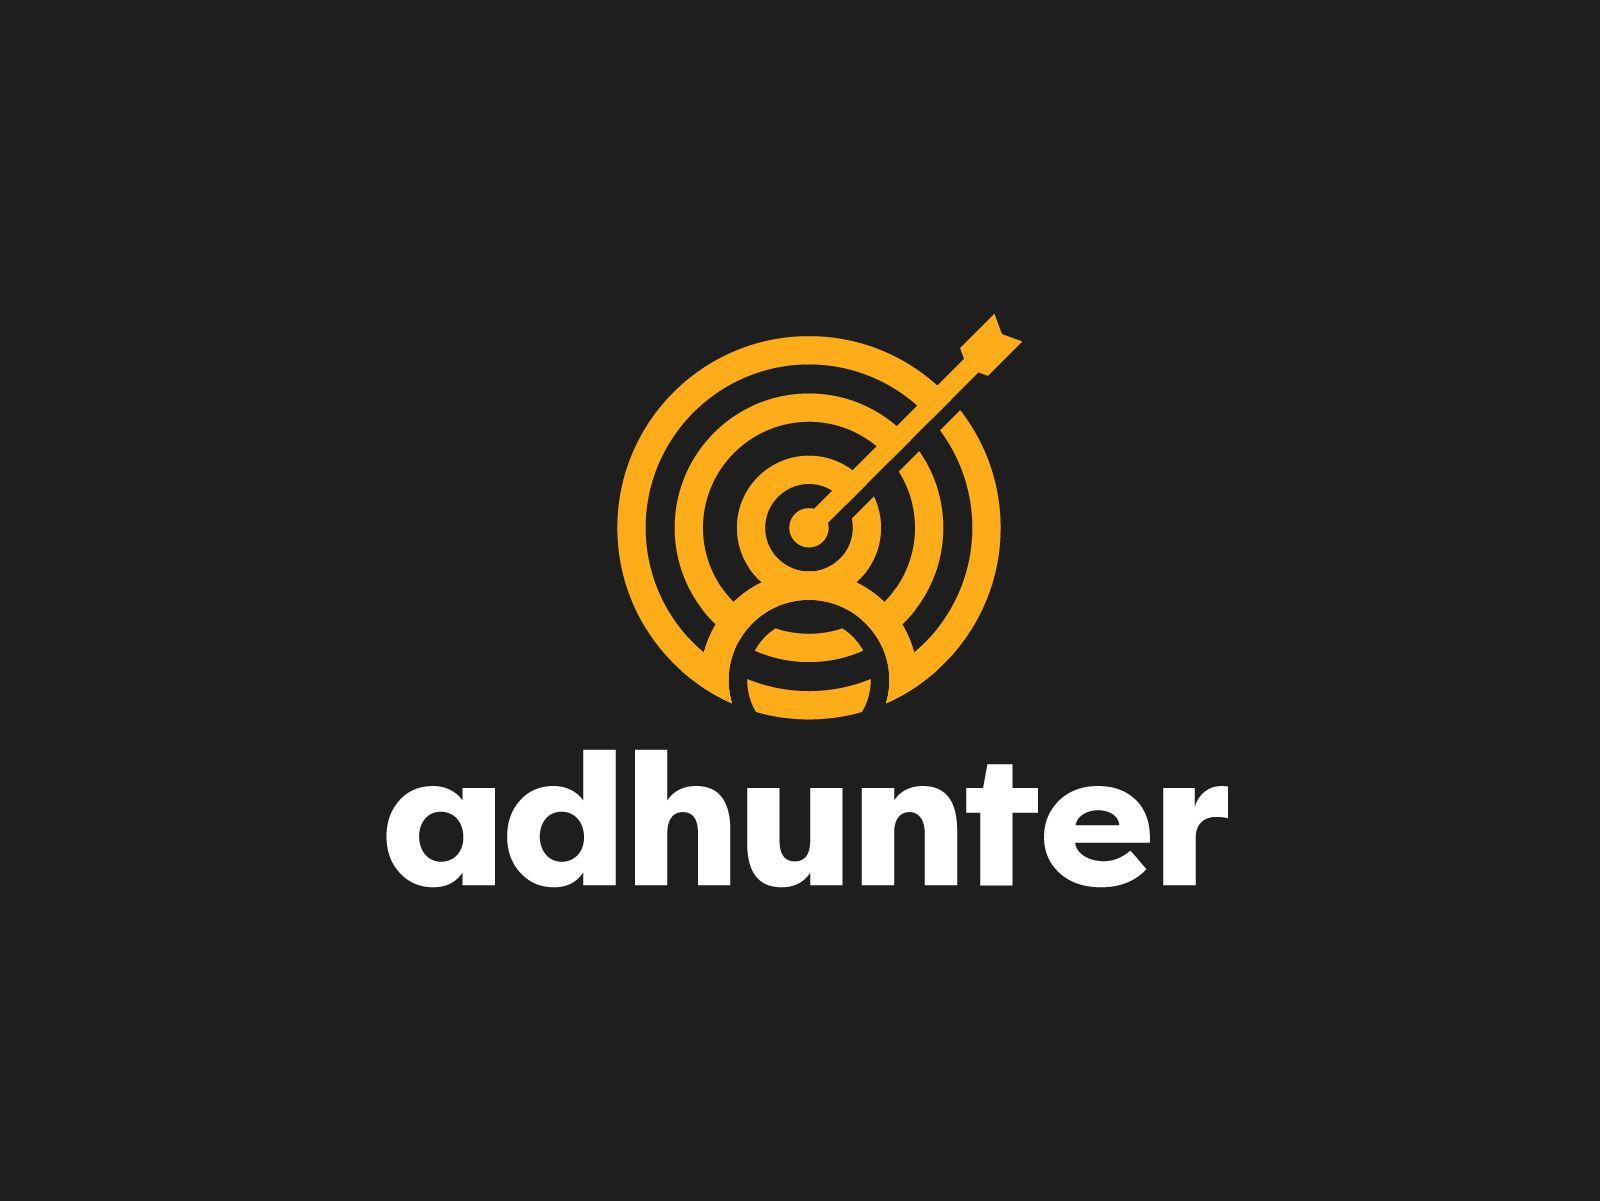 Логотип для ad hunt (сайт adhunt.ru ) - дизайнер jurabezumno17